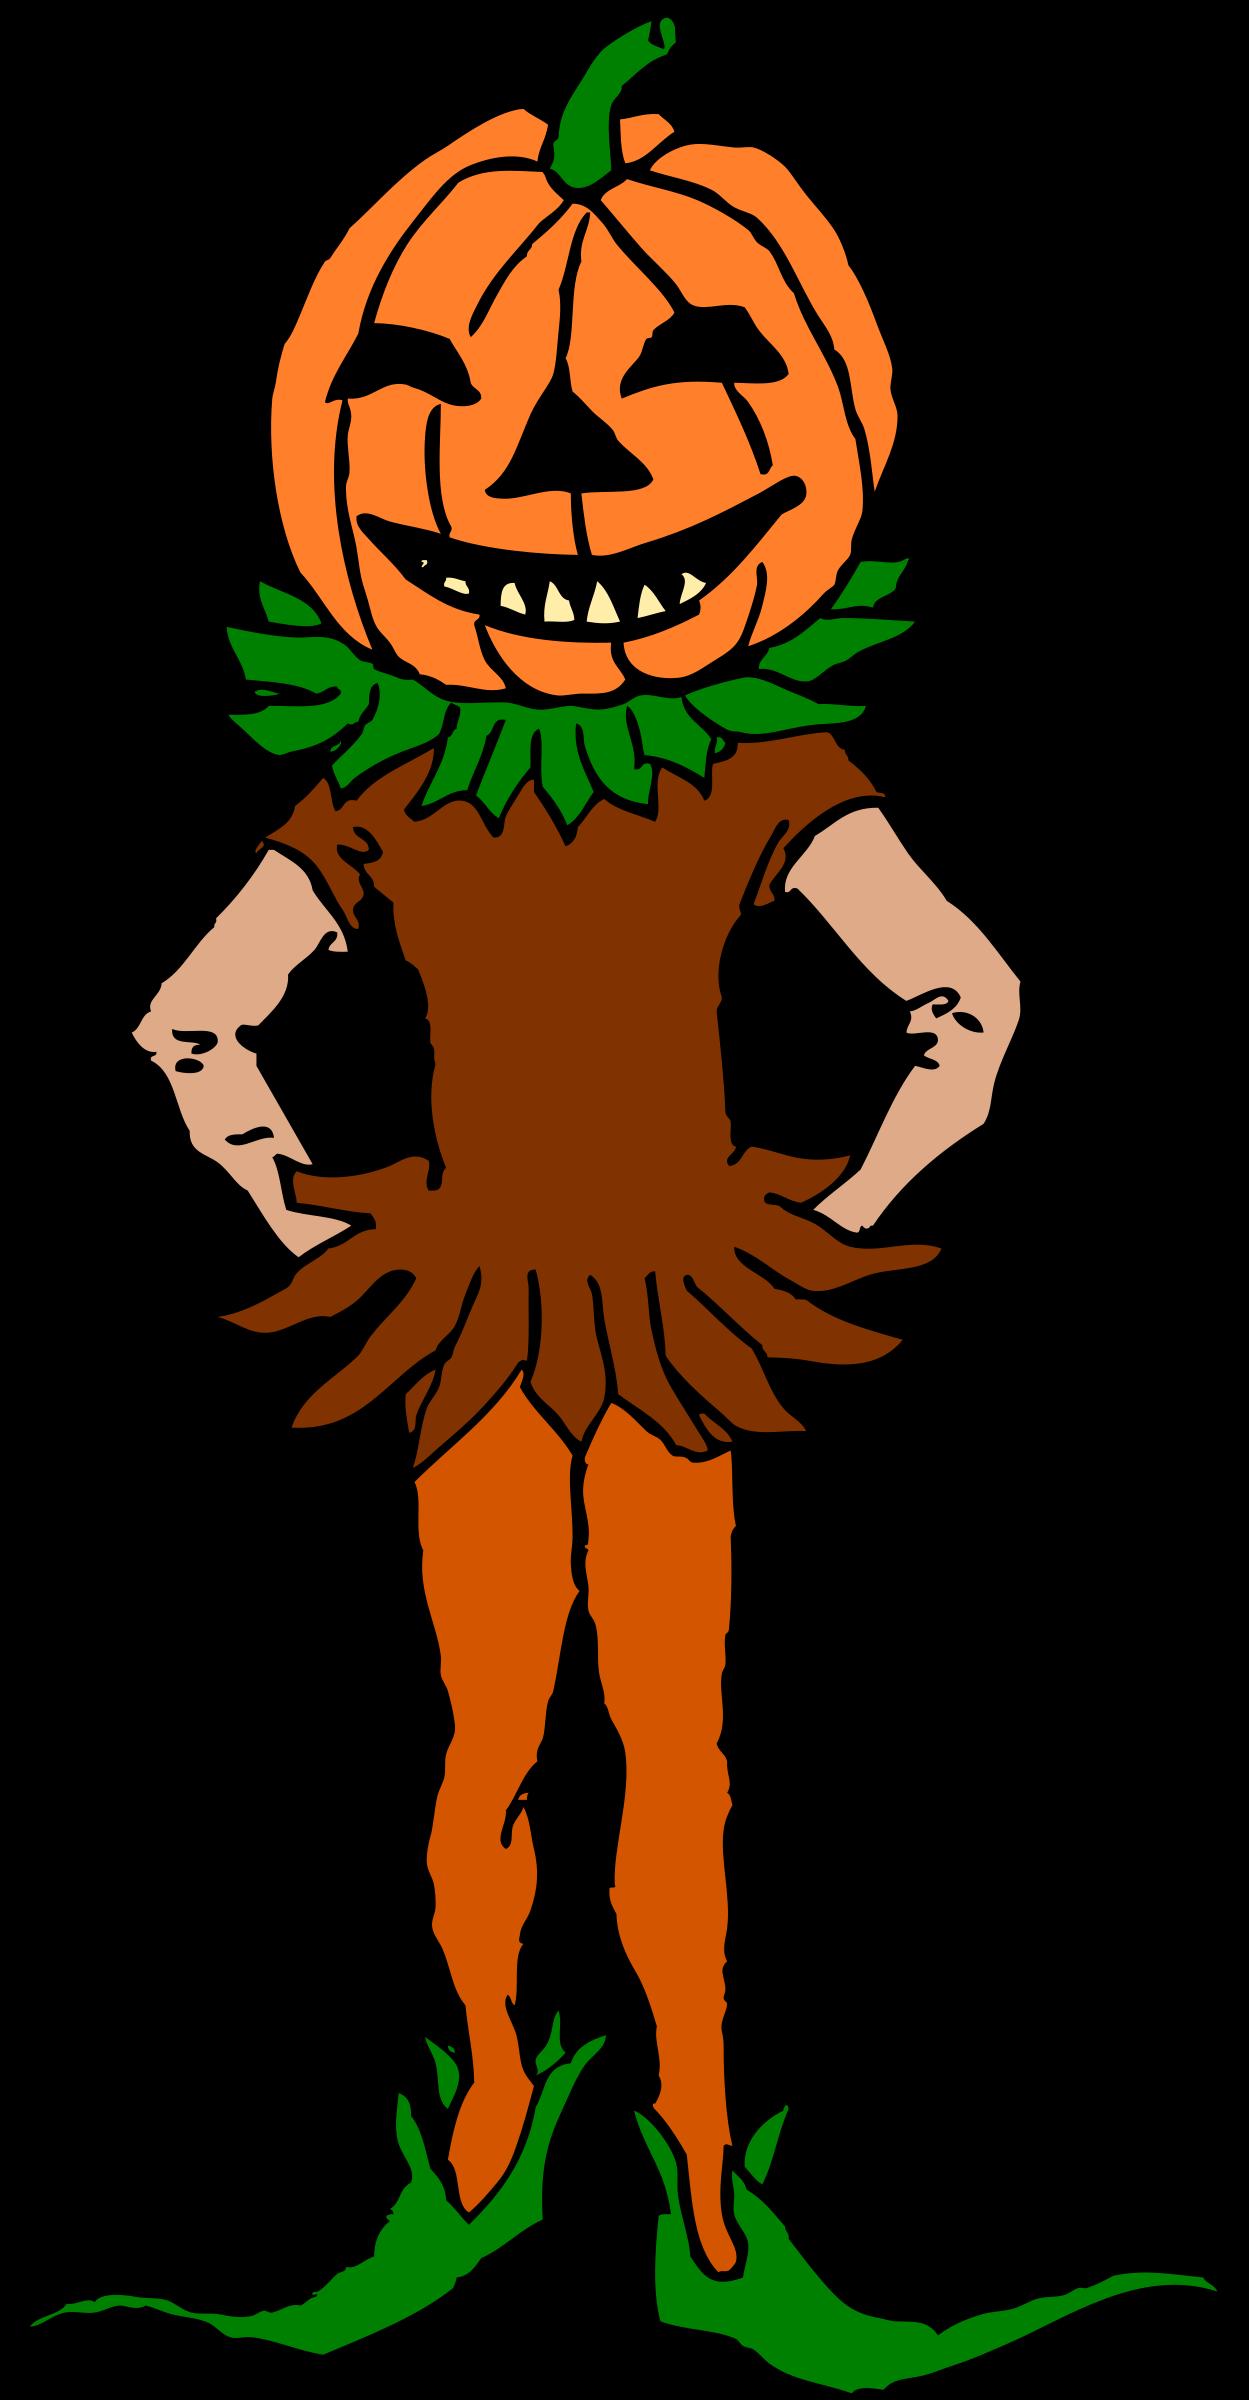 Clipart person color. Pumpkin boy version big